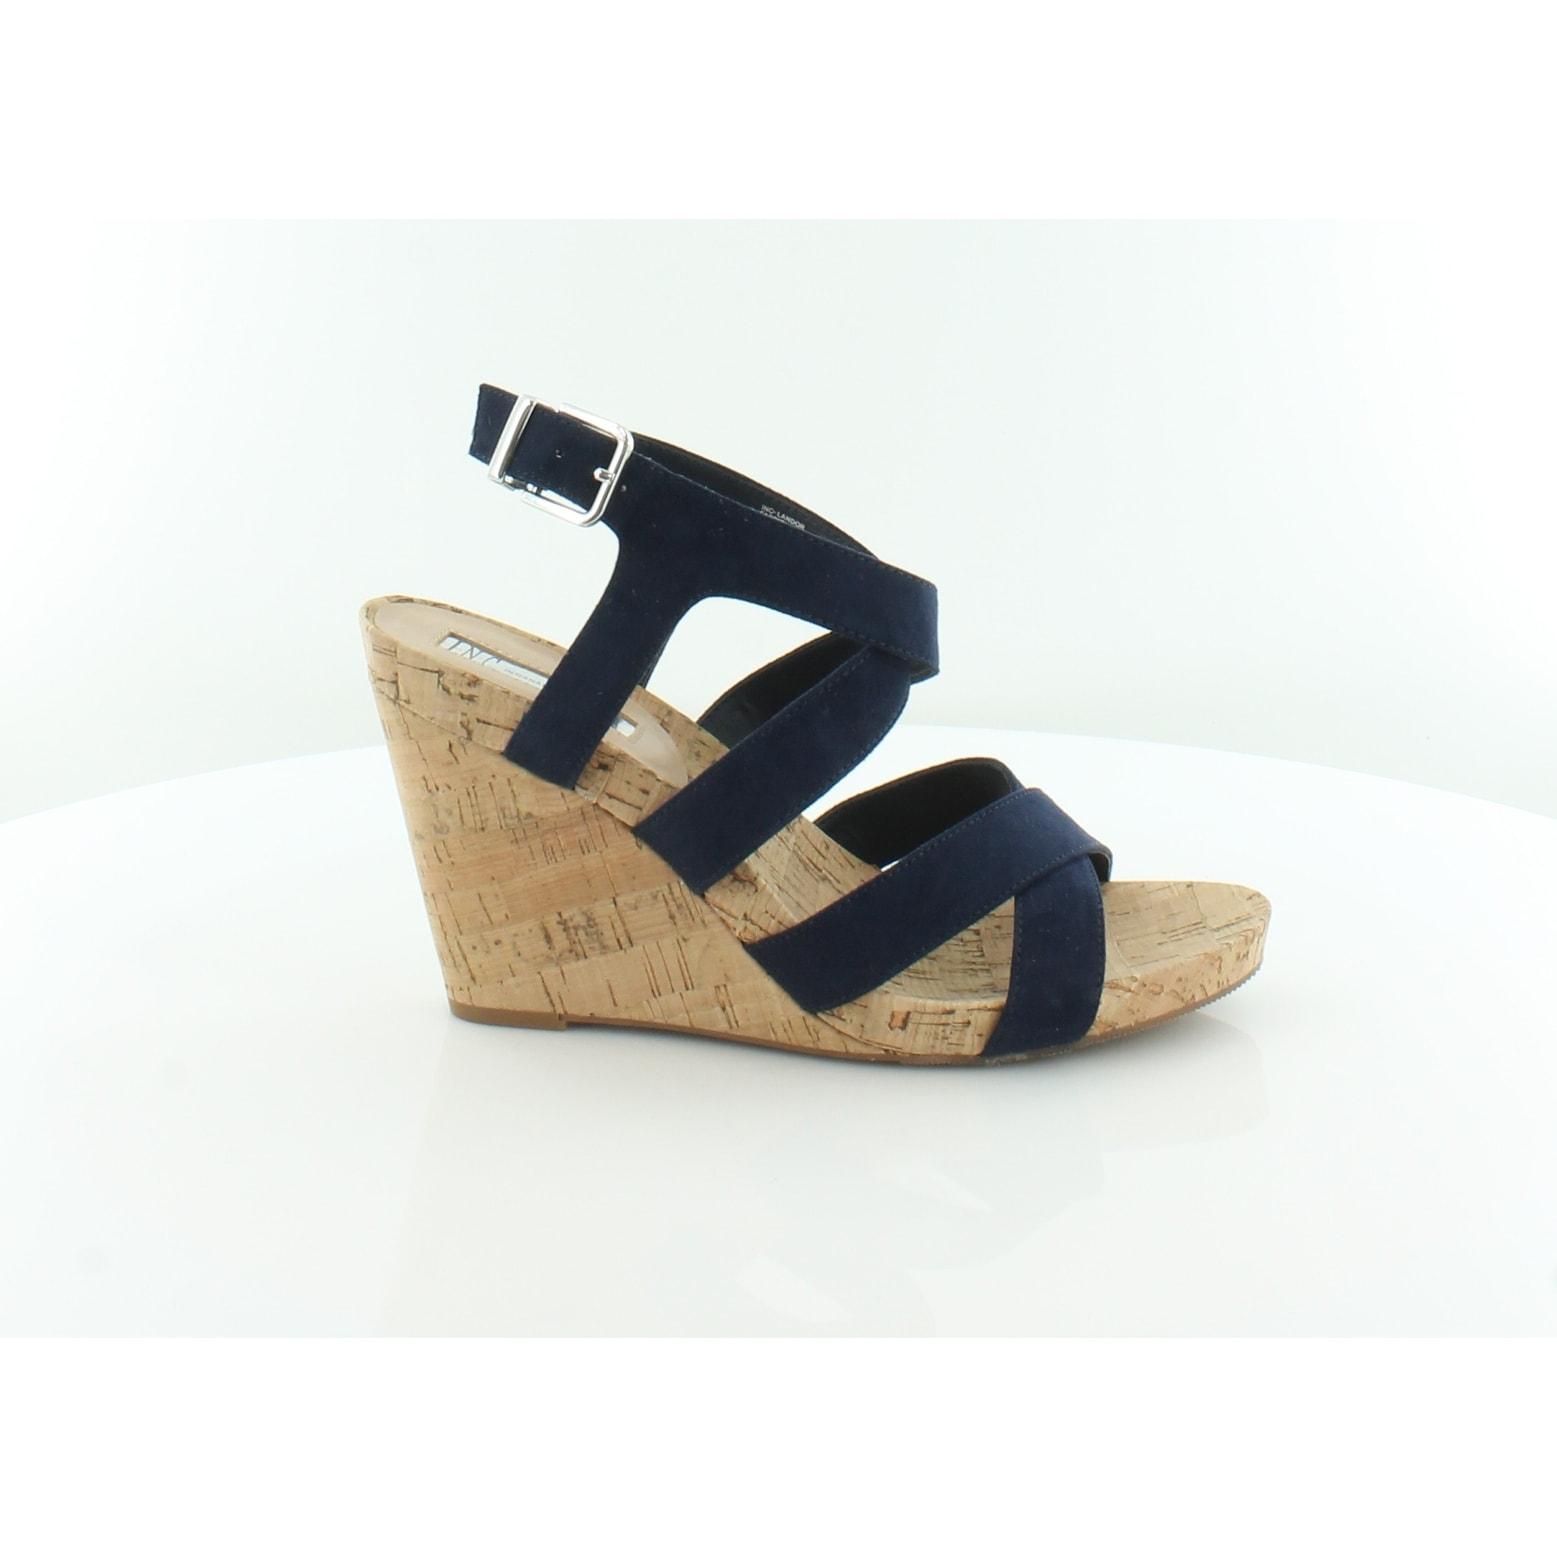 23d98e78a447 Buy Blue INC INTERNATIONAL CONCEPTS Women s Sandals Online at Overstock